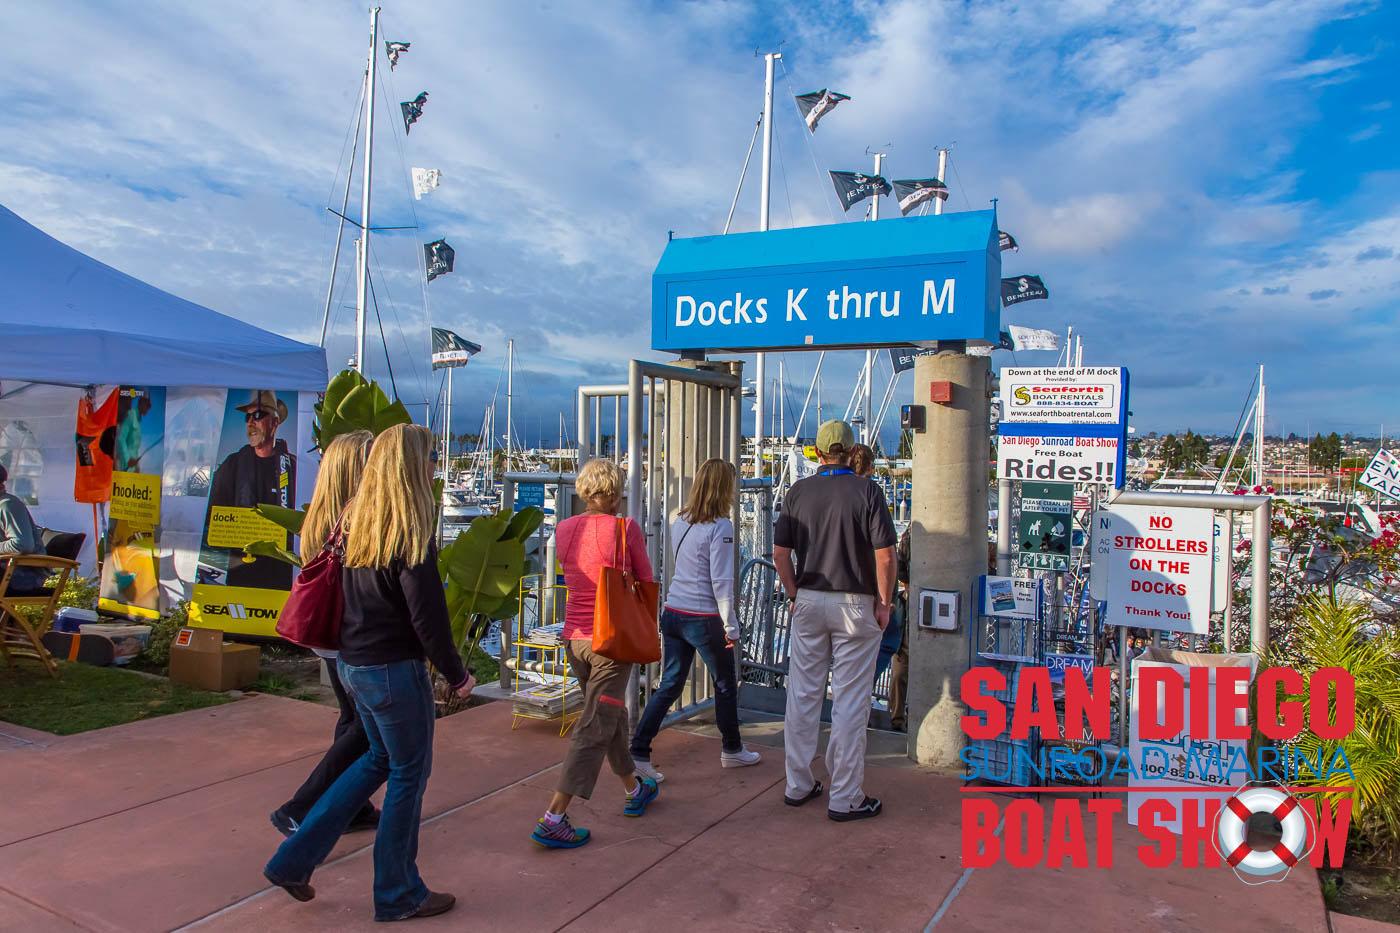 MED_SunroadBoatShow2016-82 copy